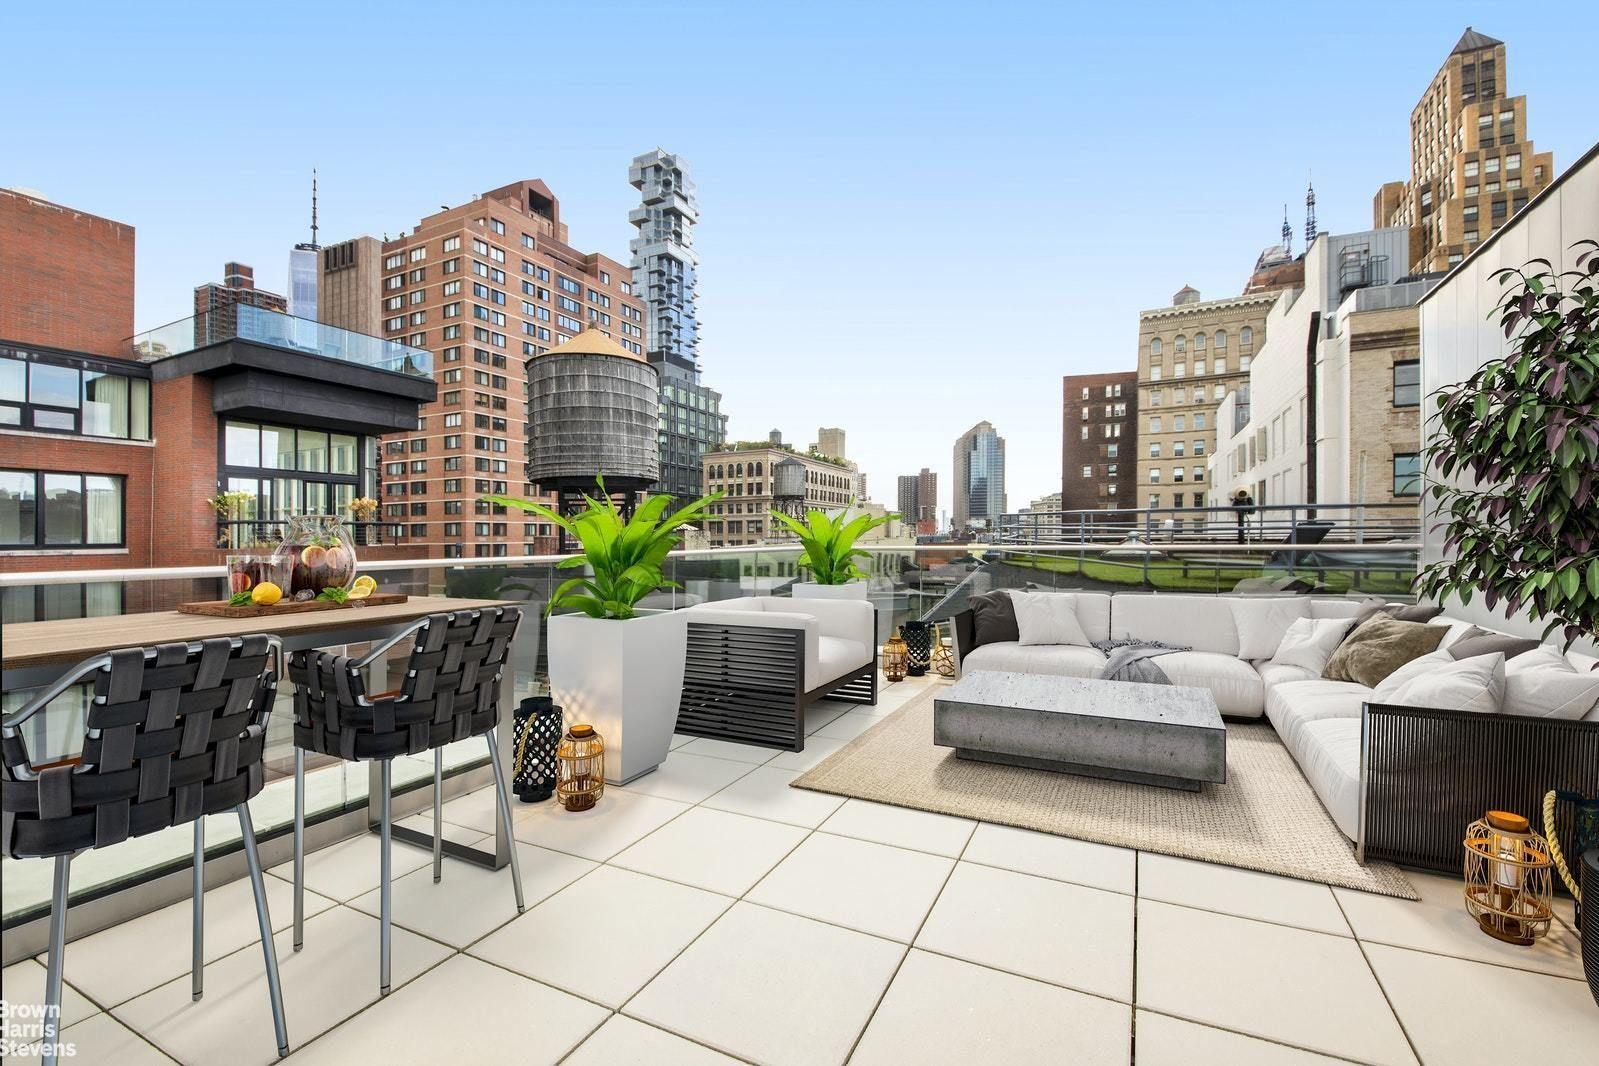 Apartment for sale at 83 Walker Street, Apt 9